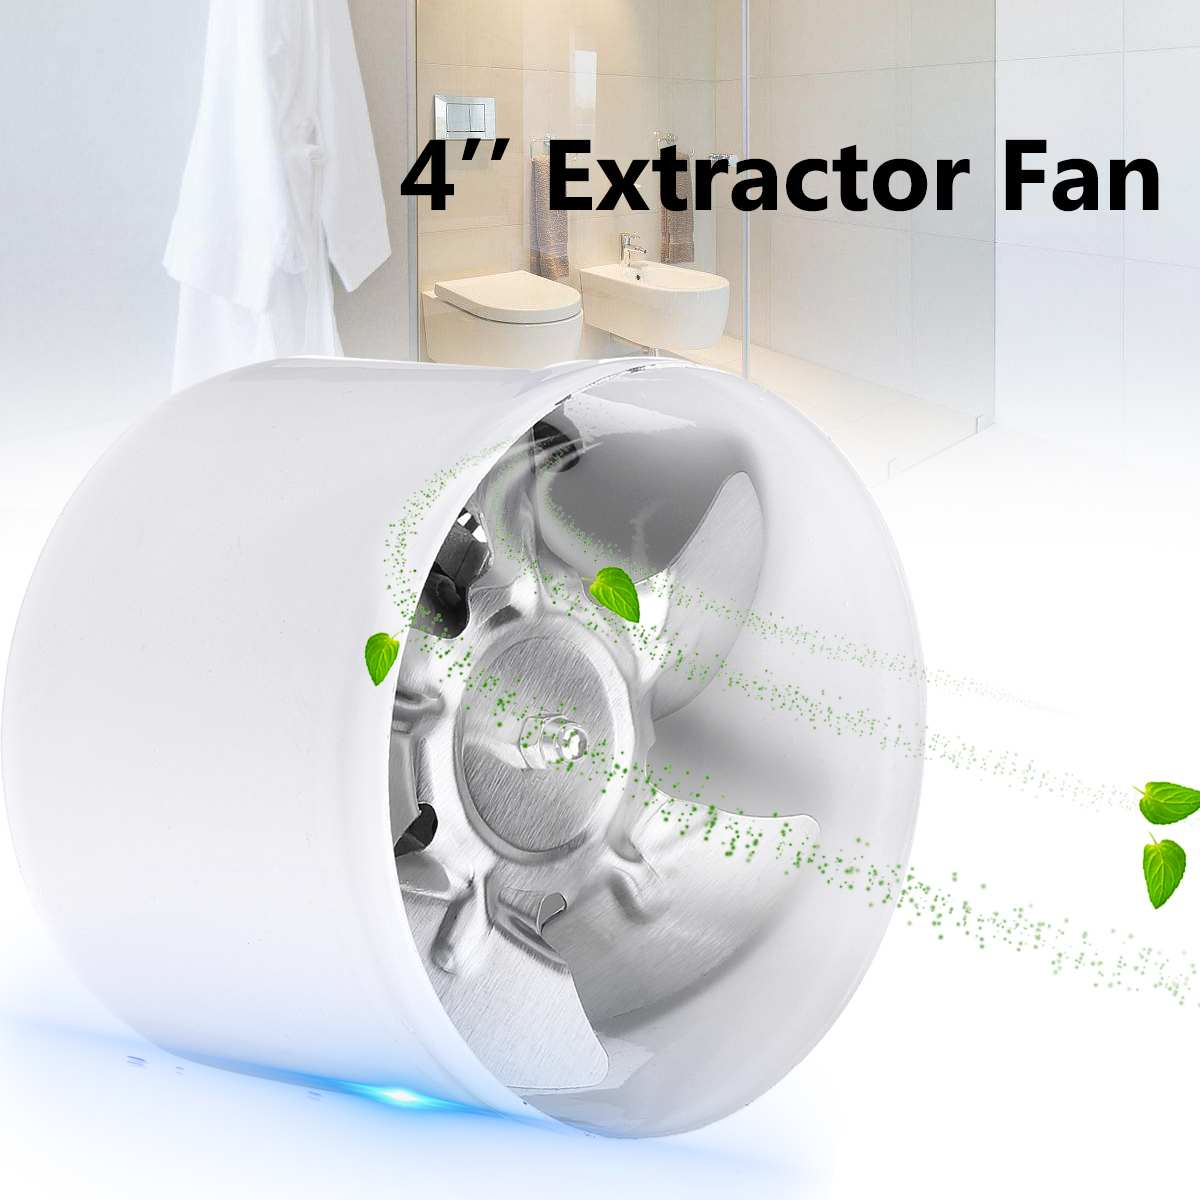 Ventilation-Fan Wall-Extractor Toilet Exhaust-Blower Vents Cooling Window Bathroom Kitchen